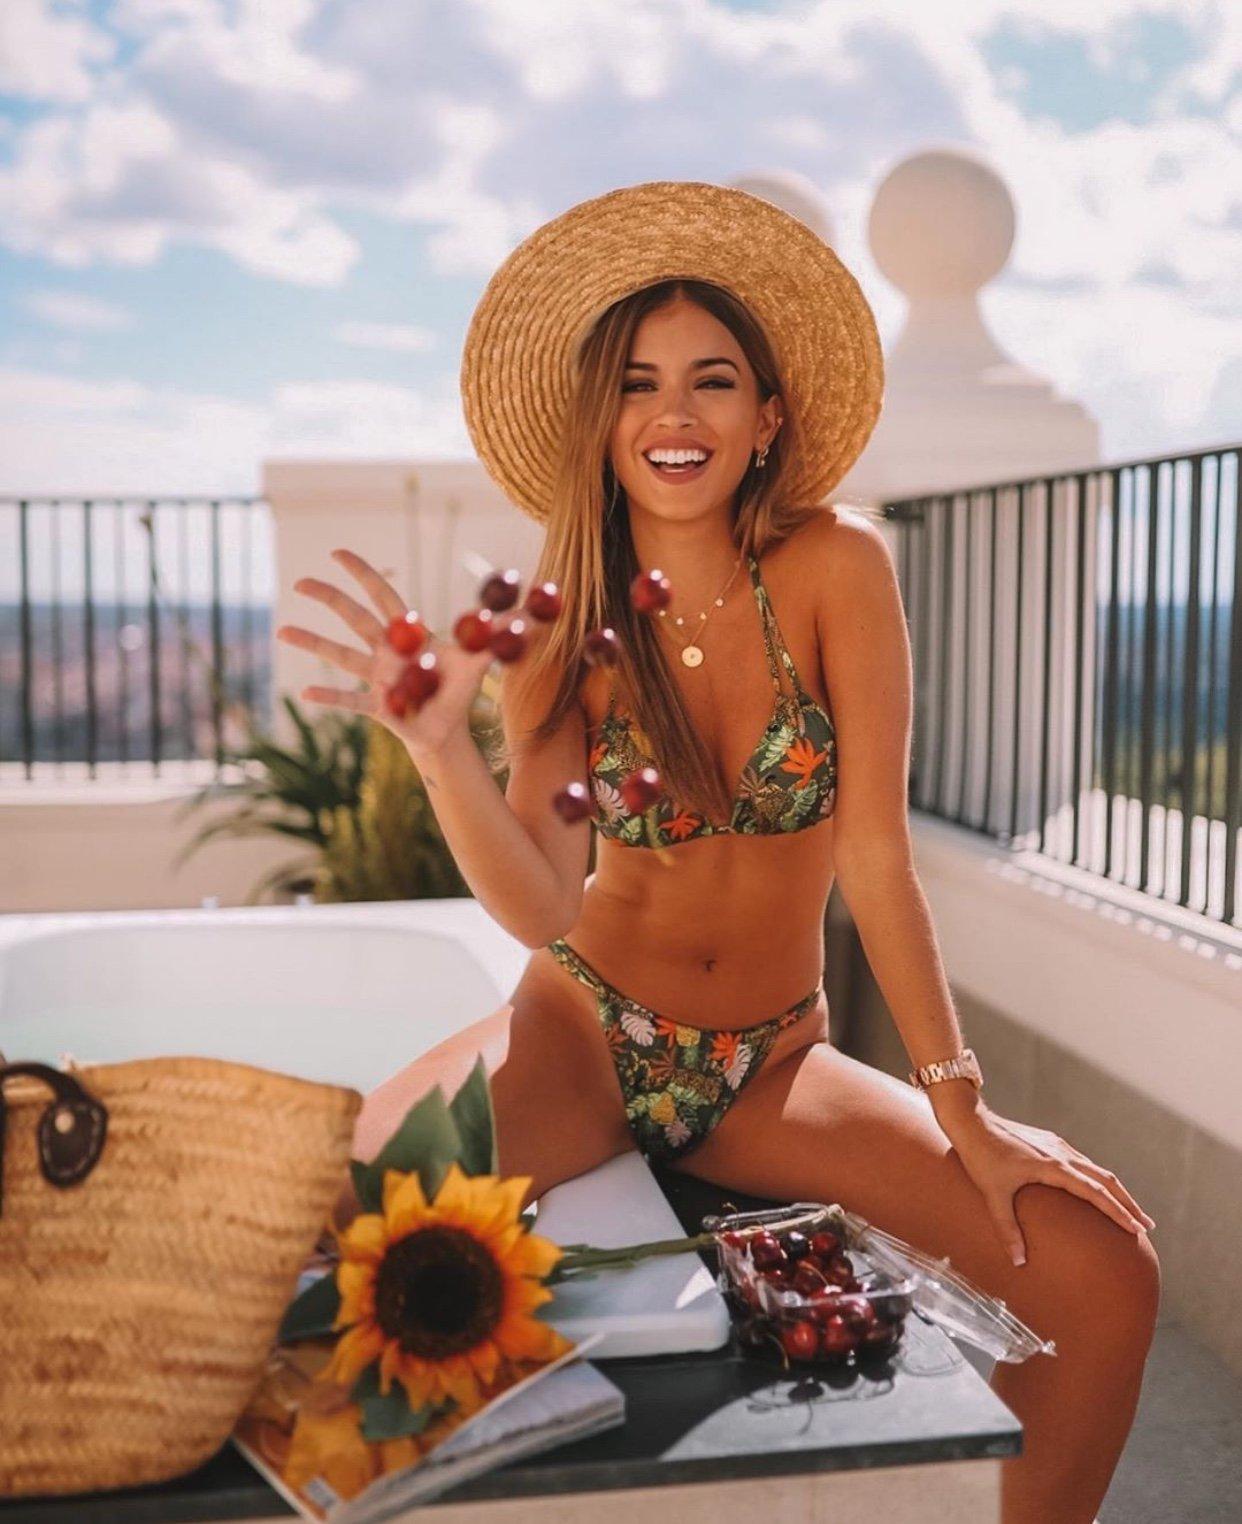 El bikini de Tezenis que enamora